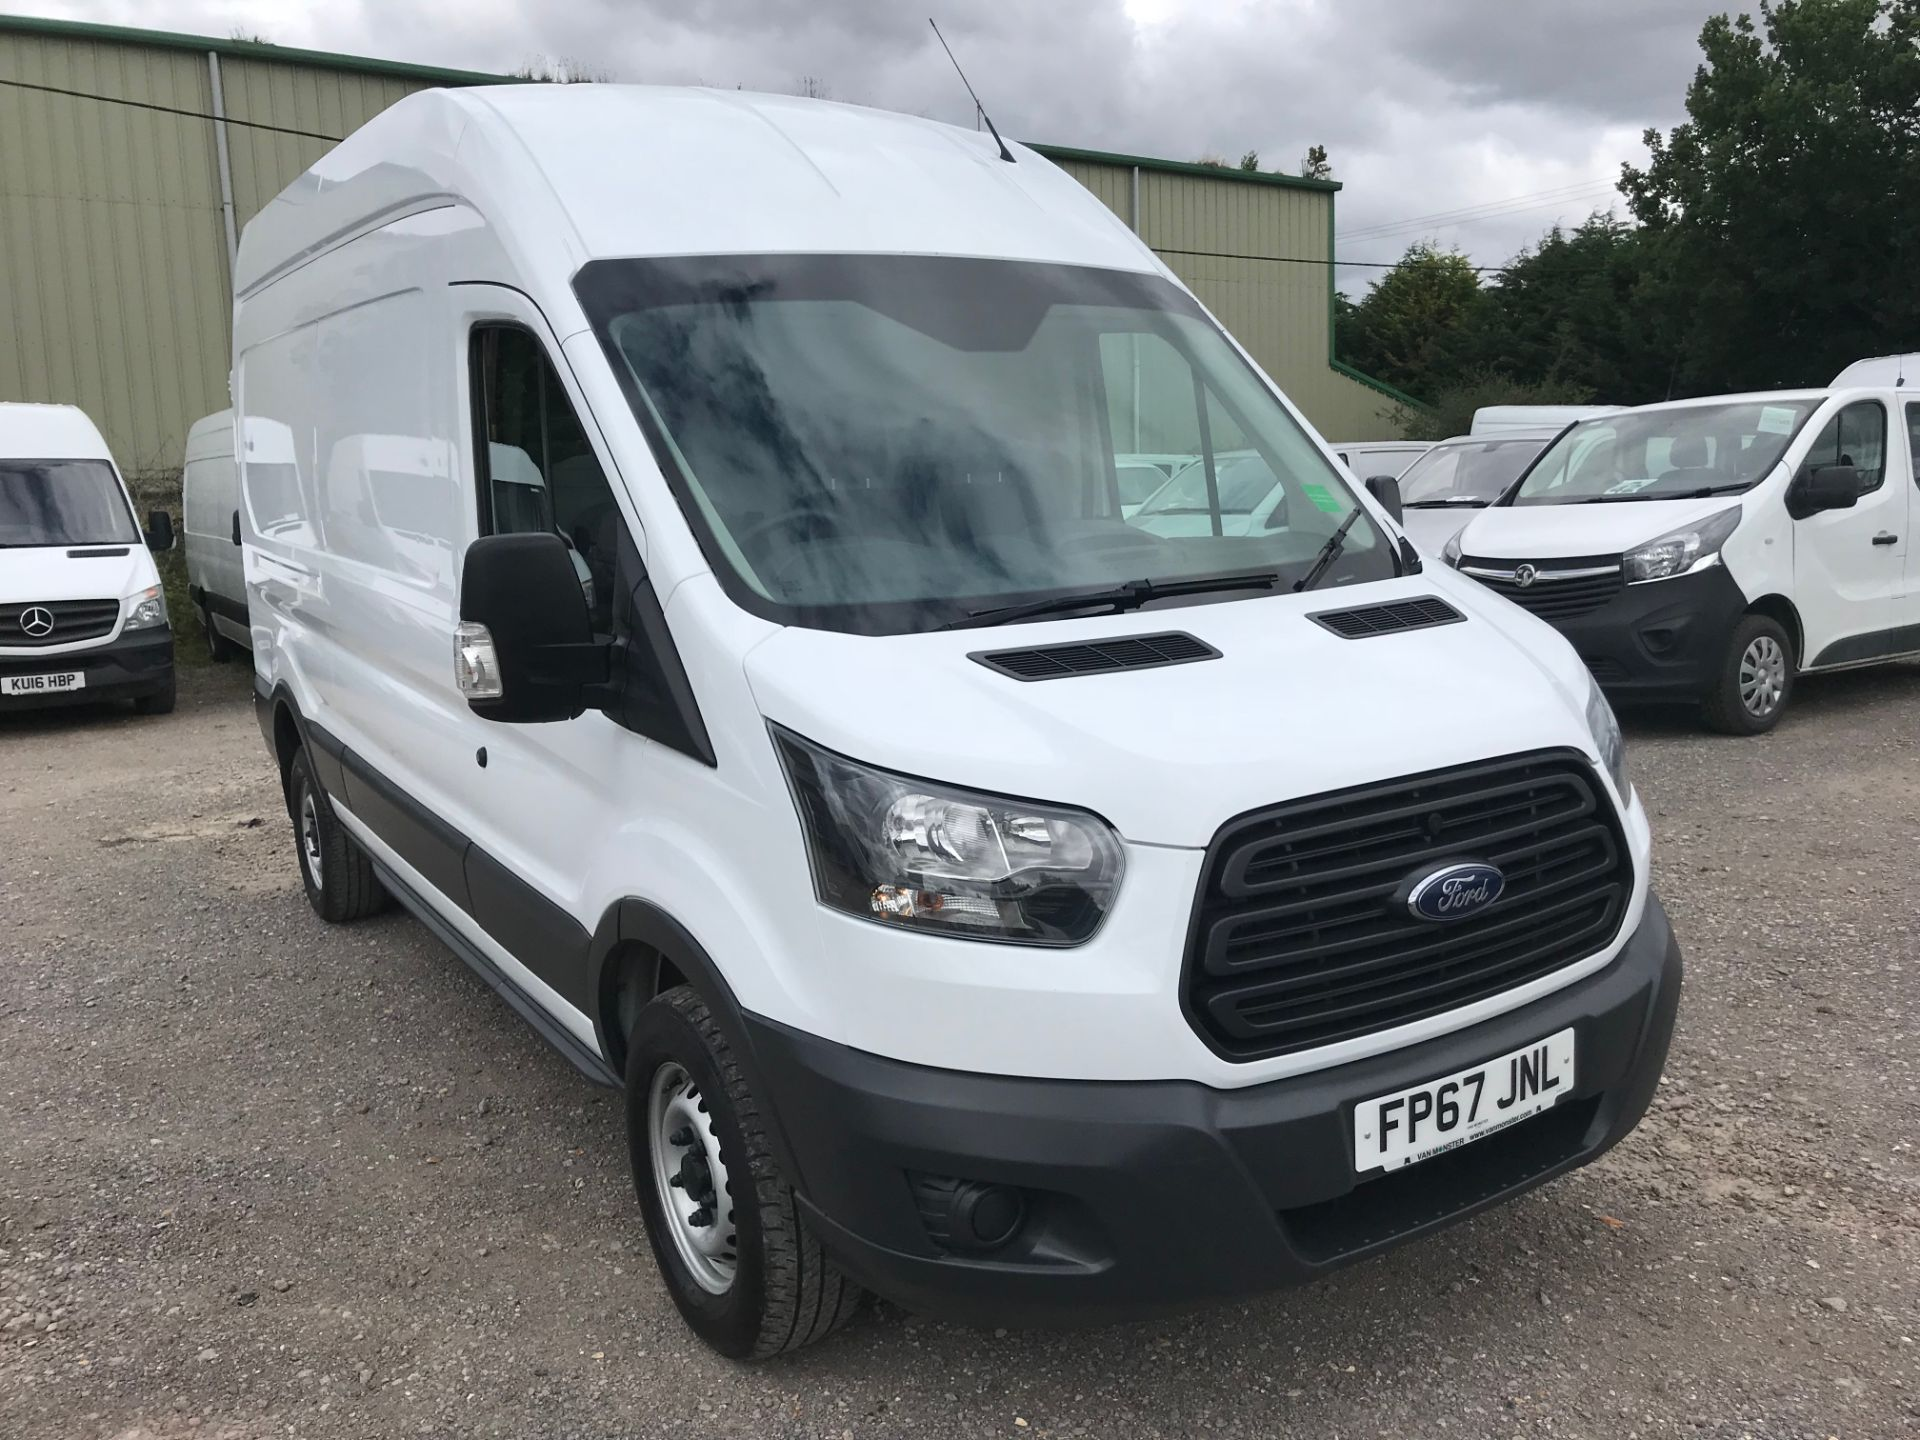 2017 Ford Transit L3 H3 VAN 130PS EURO 6 (FP67JNL)